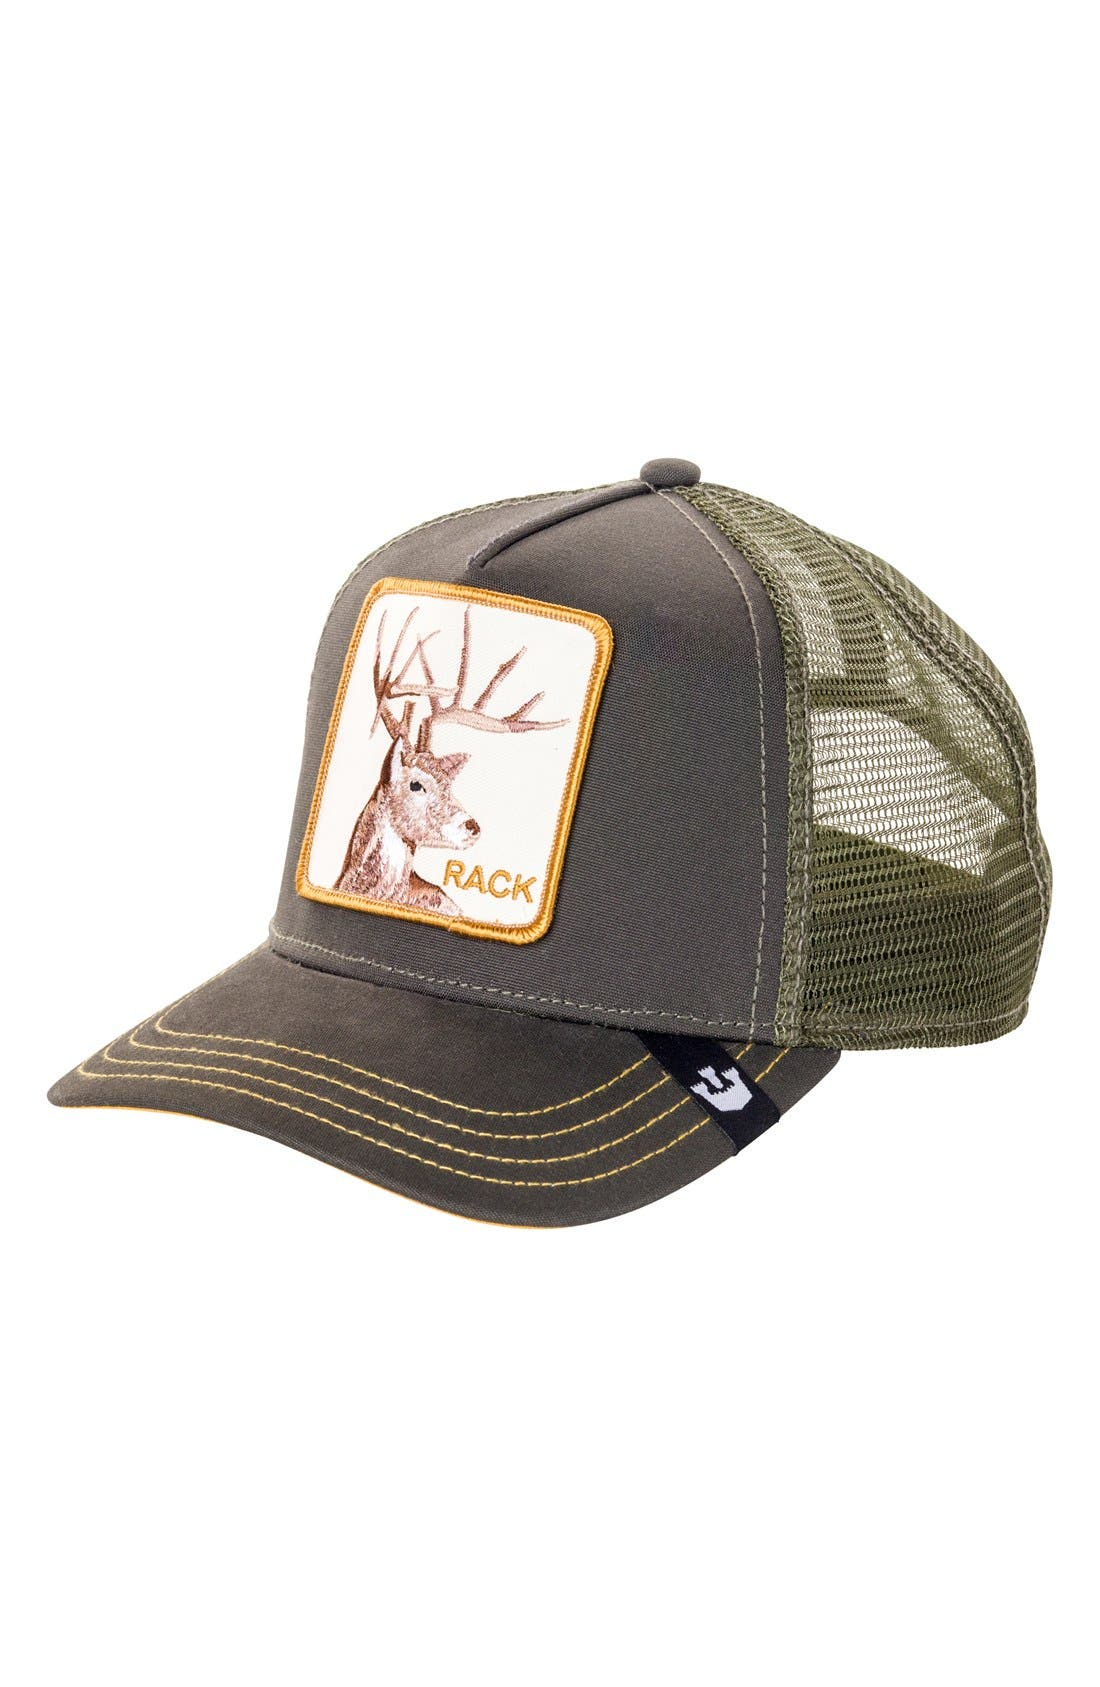 Goorin Brothers 'Animal Farm - Rack' Trucker Hat